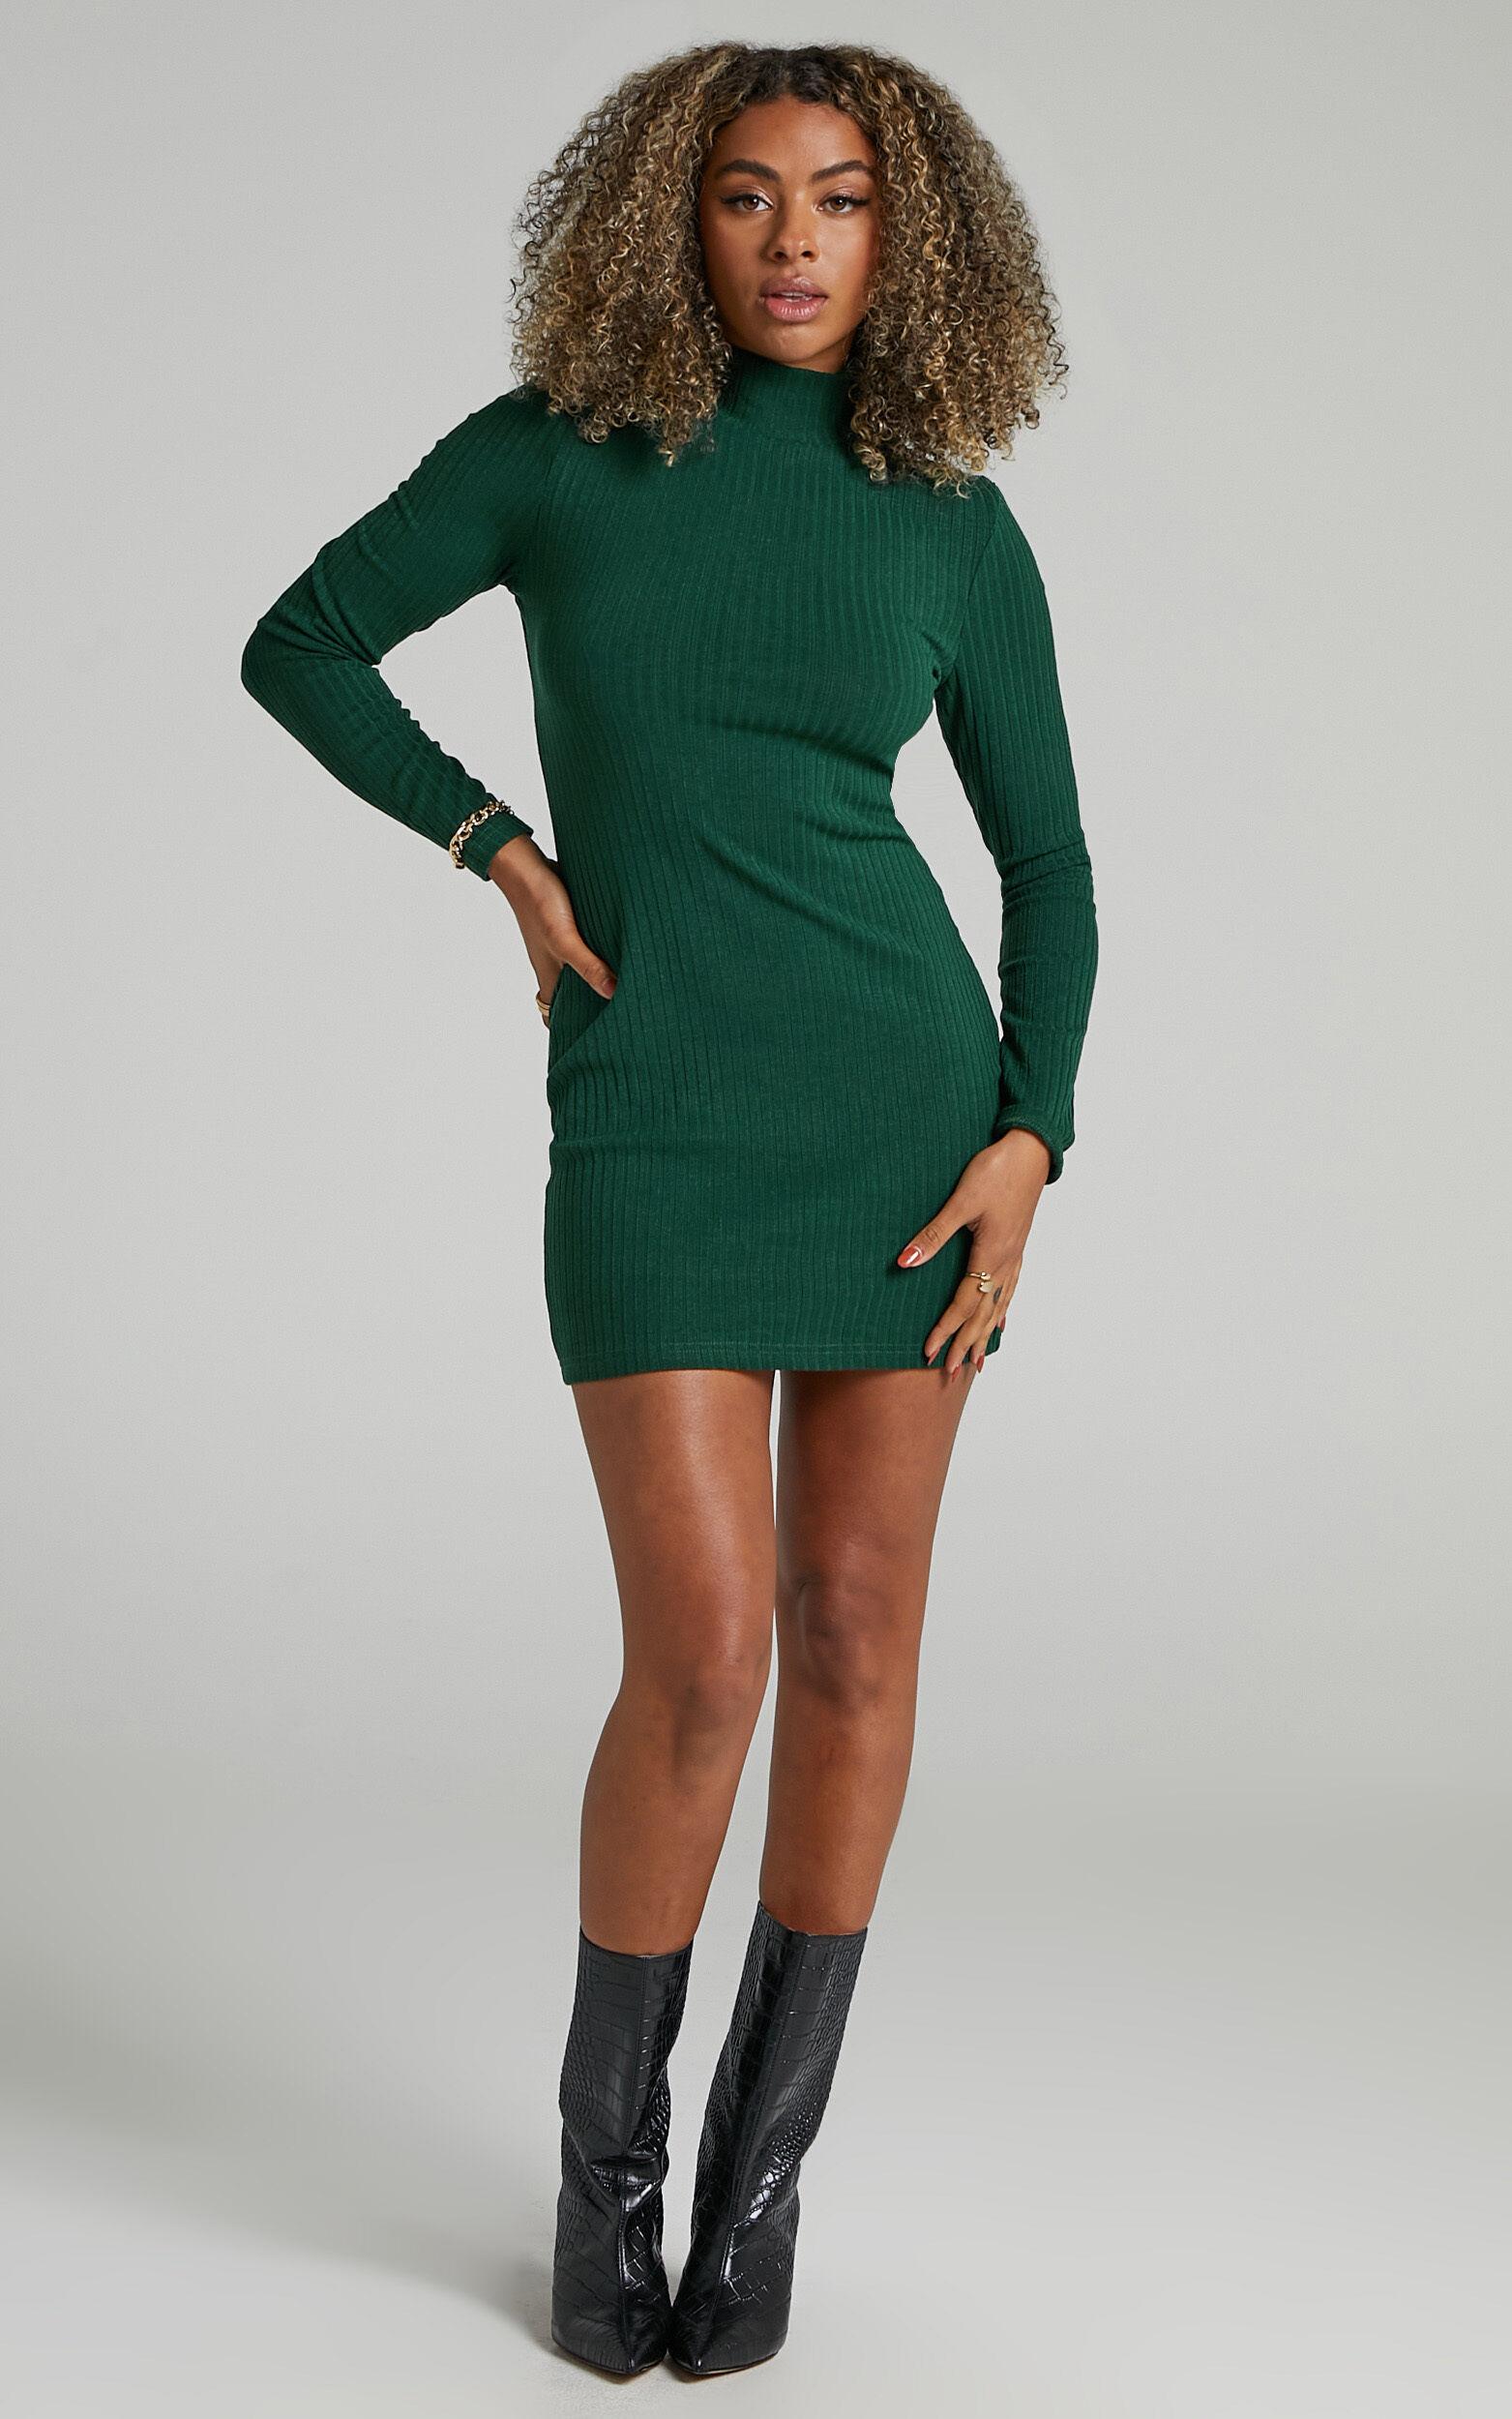 Lillia High Neck Bodycon Mini Dress in Emerald - 06, GRN1, super-hi-res image number null